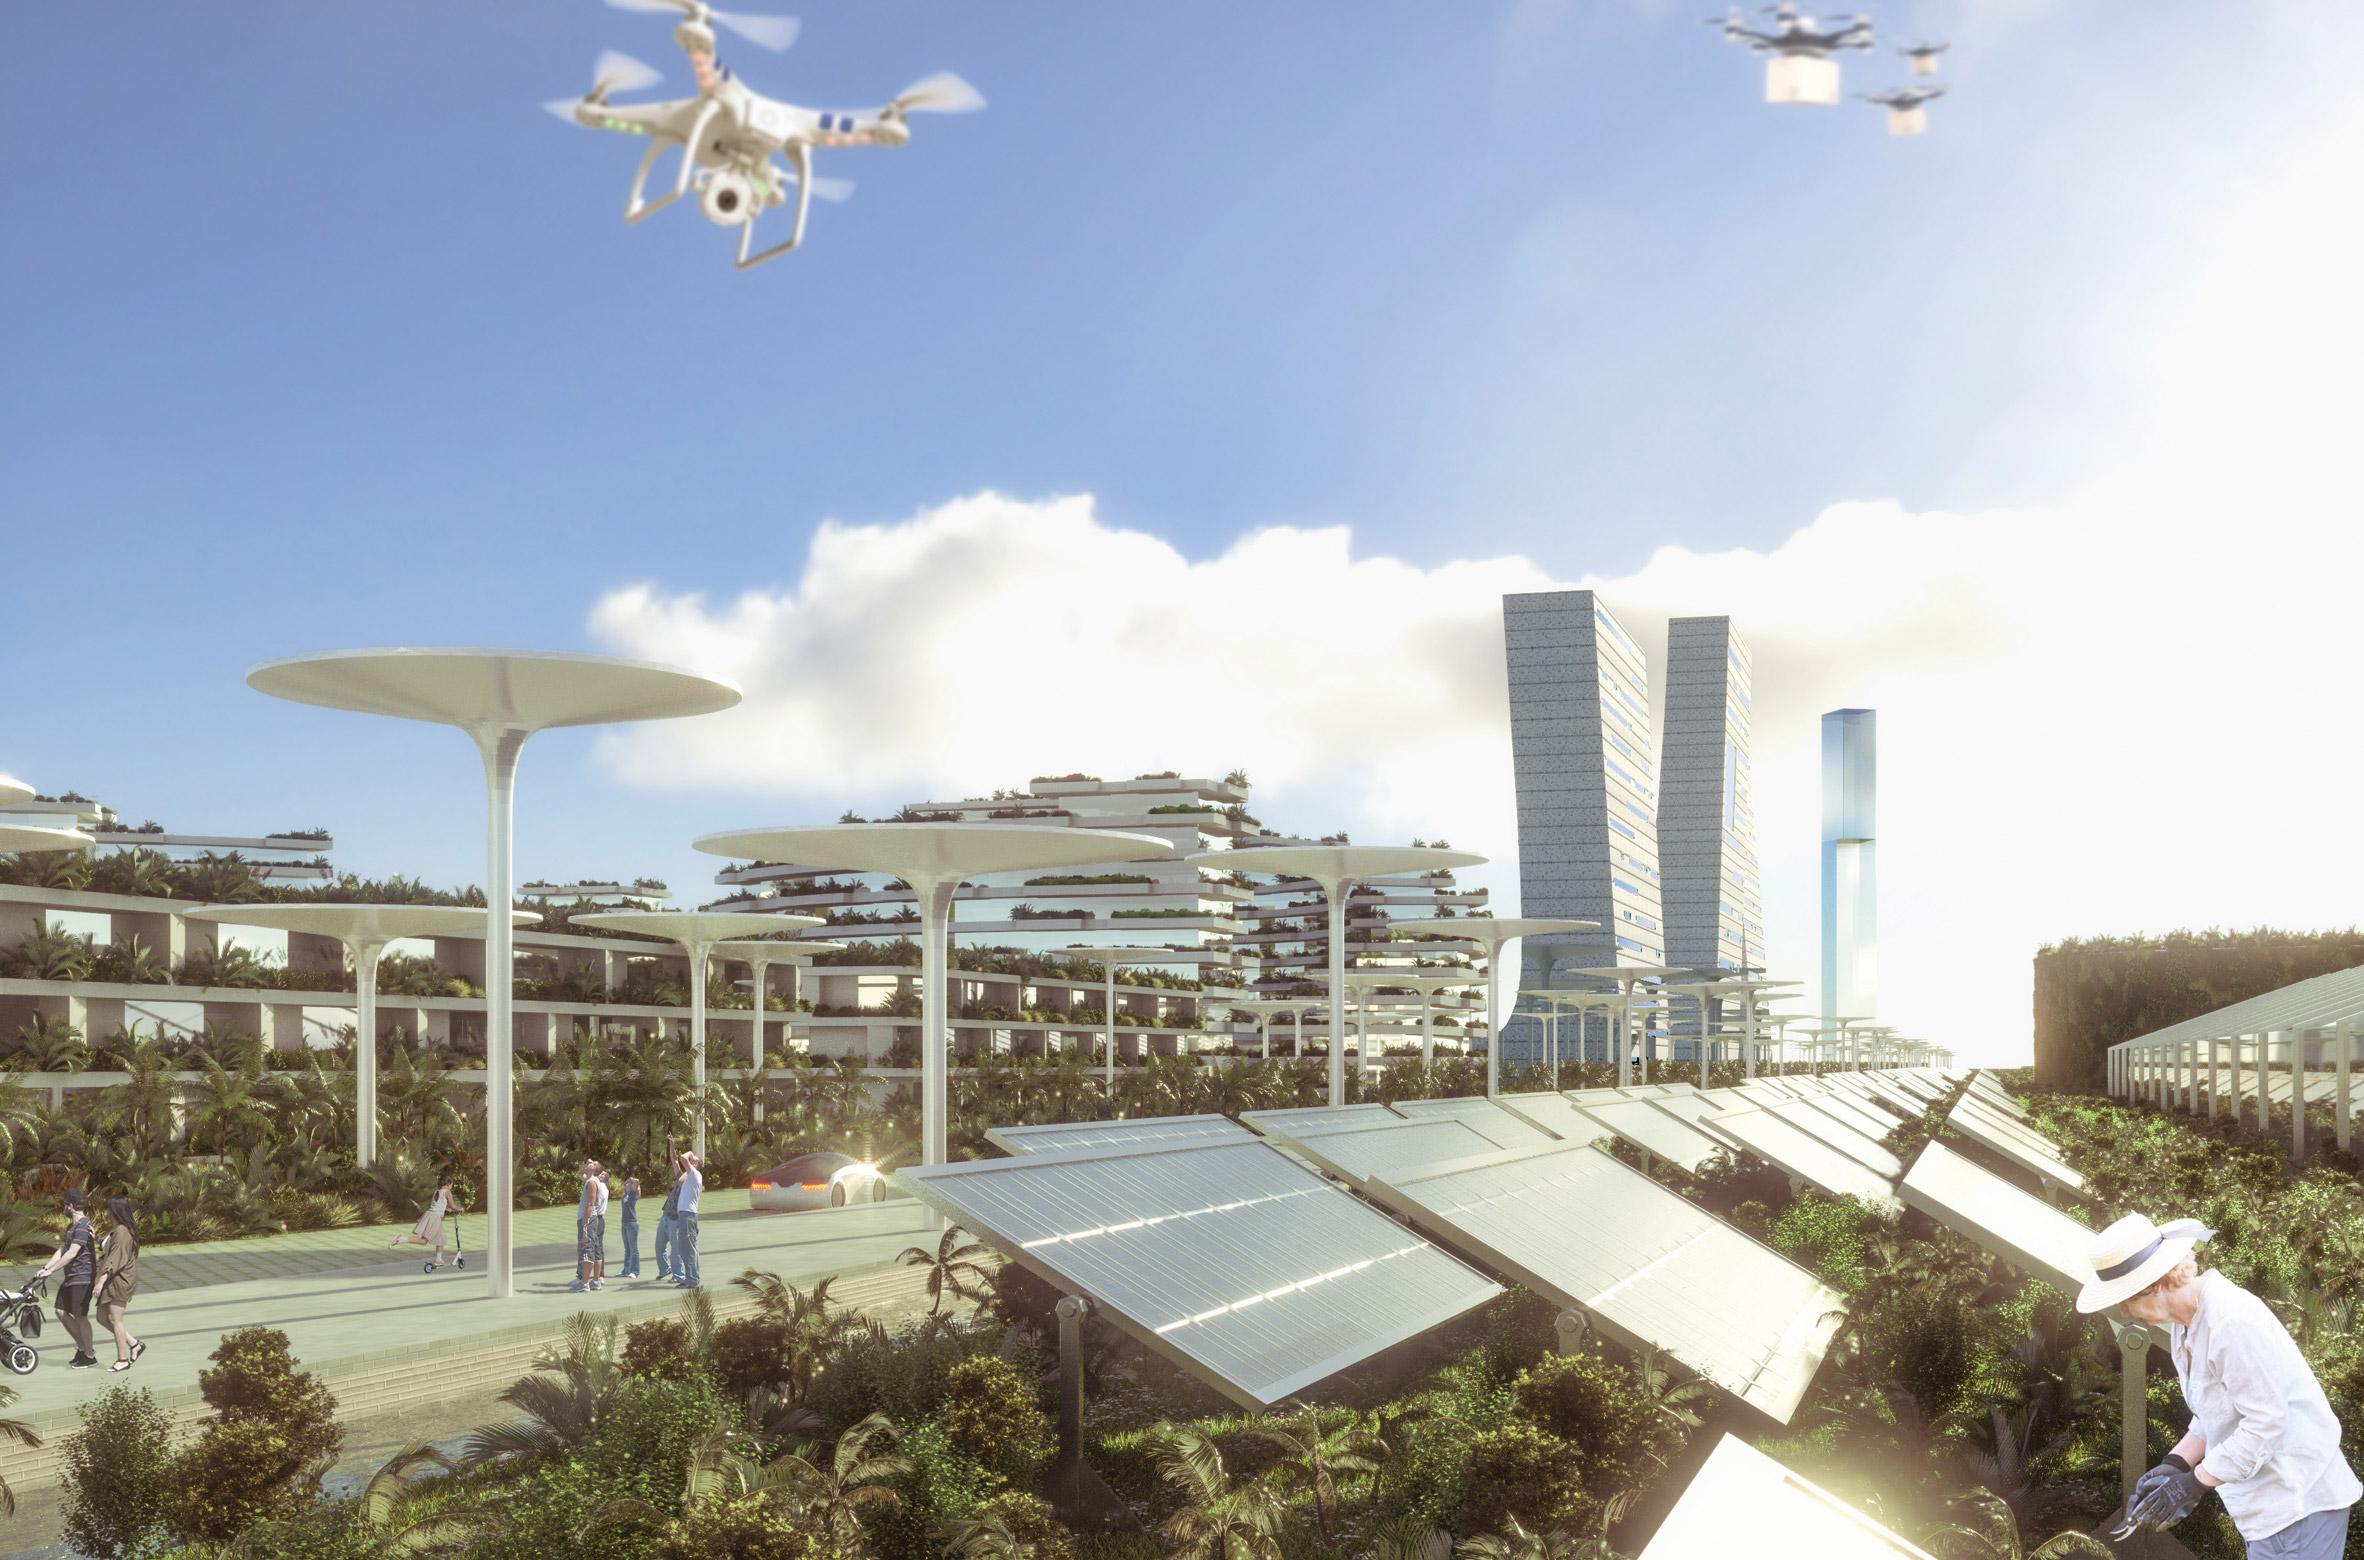 smart forest city, stefano boeri, stad van de toekomst, goren, mexico, cancun, architectuur, 3